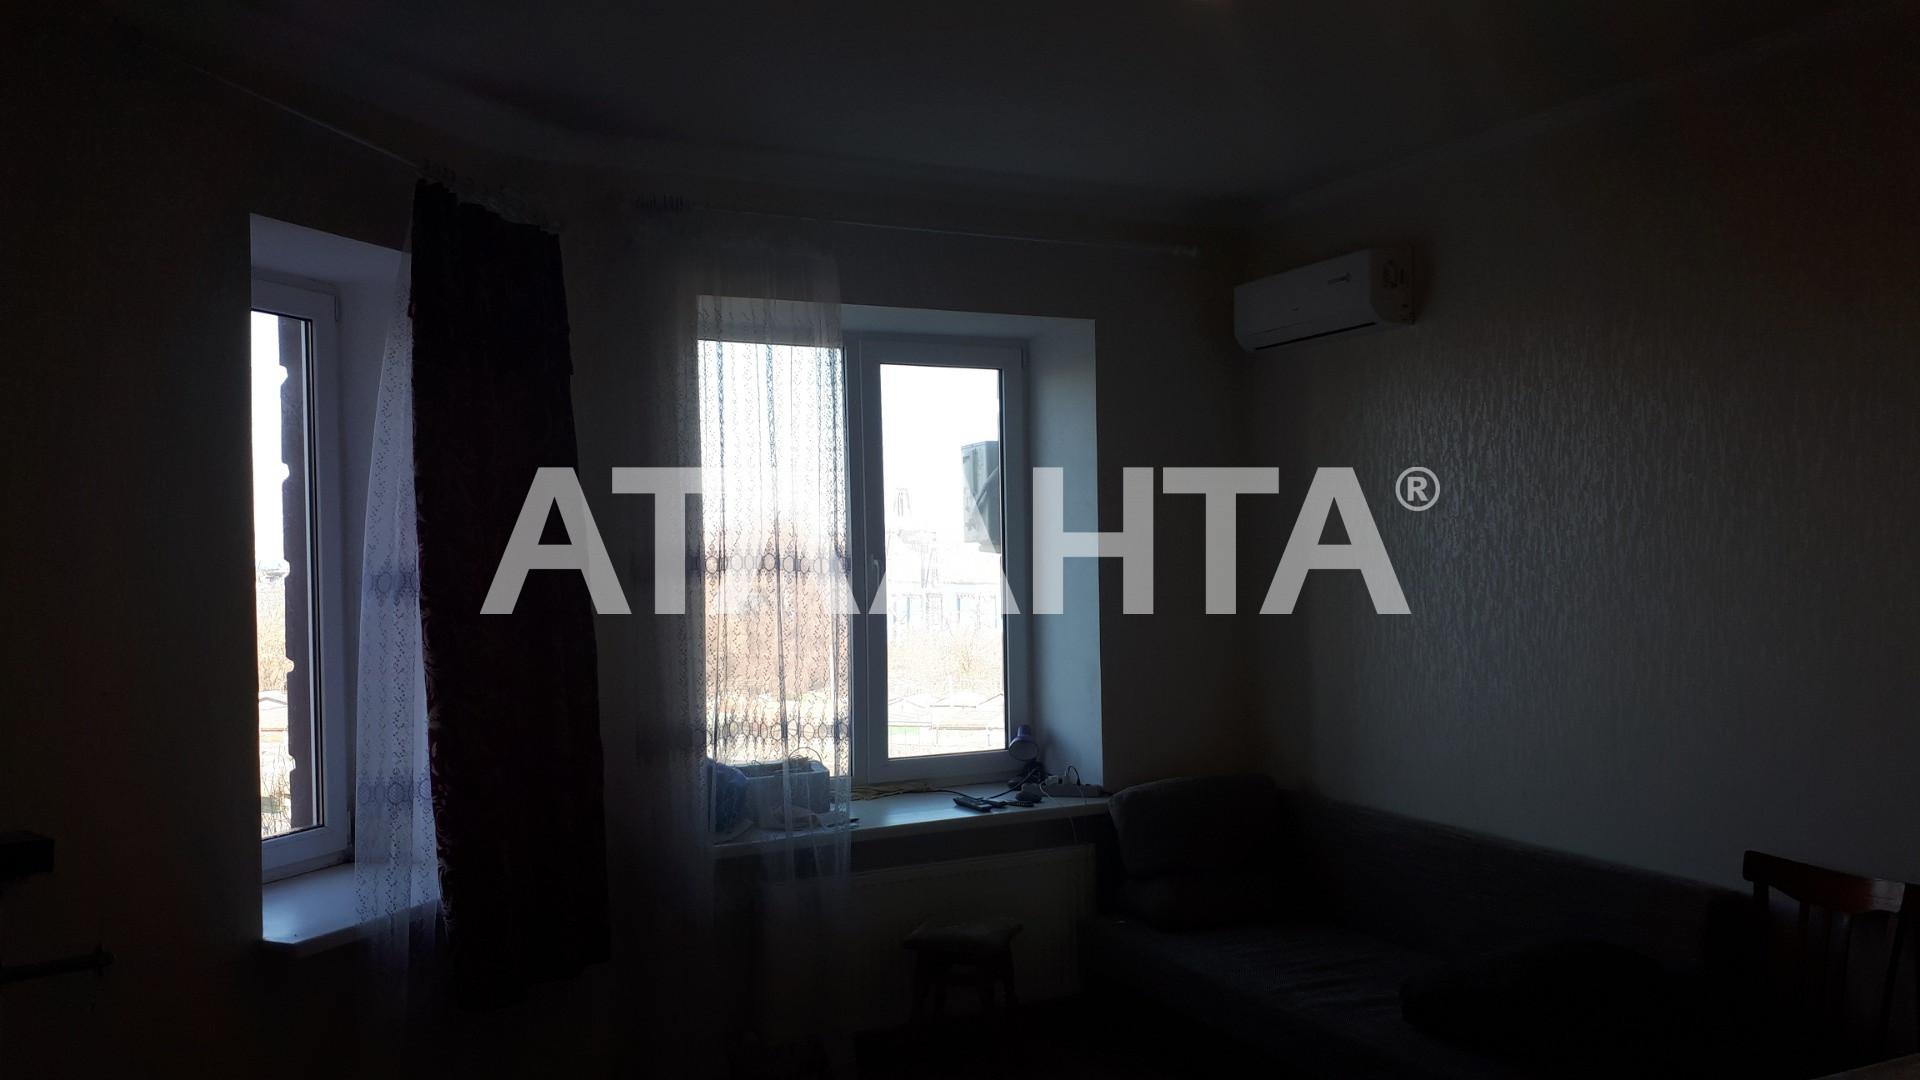 Продается 2-комнатная Квартира на ул. Хантадзе Пер. — 63 000 у.е. (фото №12)